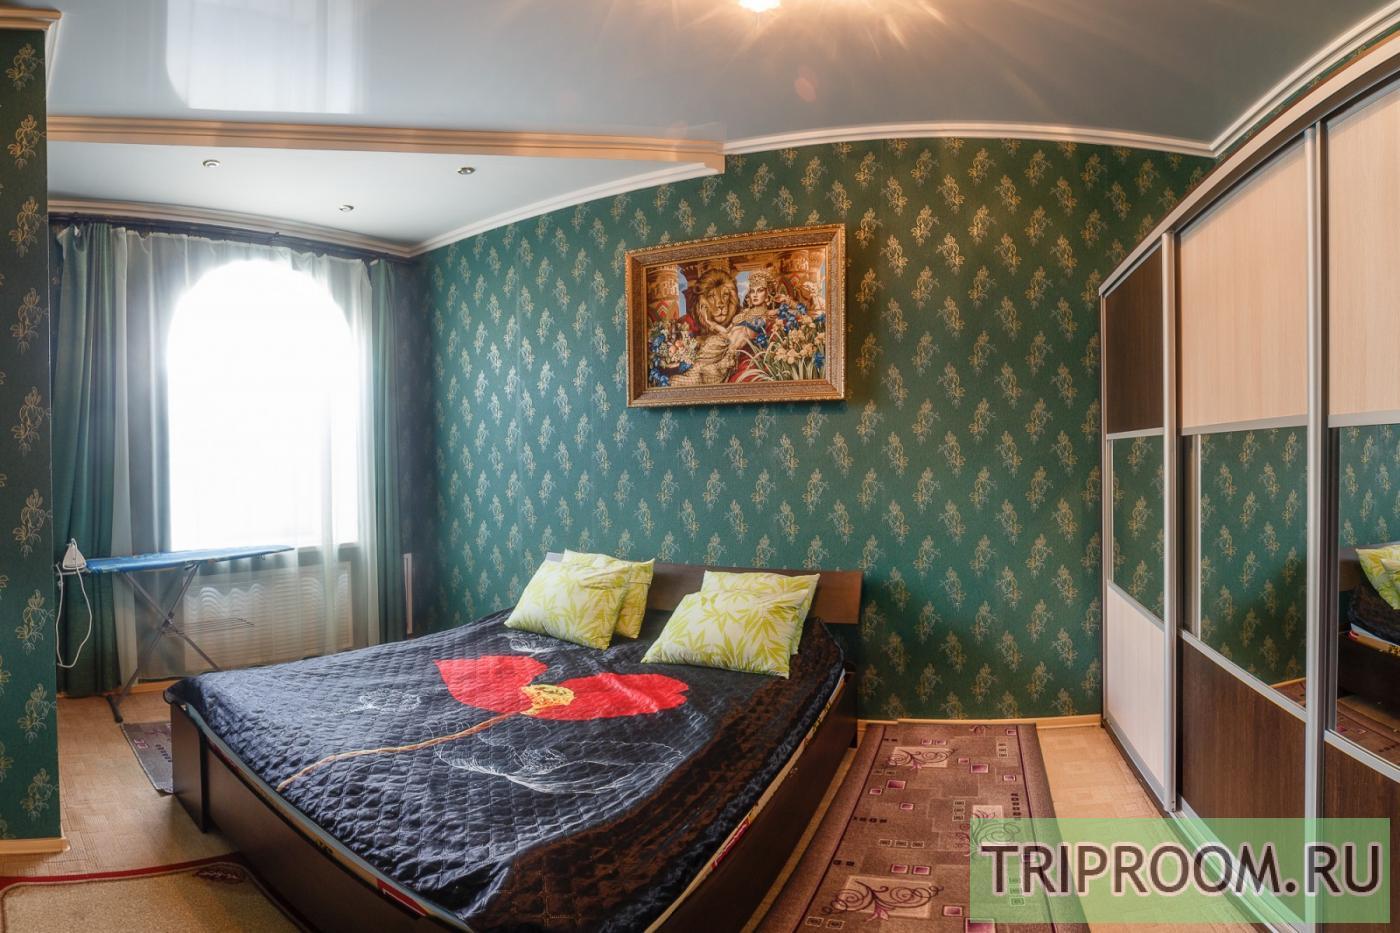 3-комнатная квартира посуточно (вариант № 15948), ул. Назарбаева улица, фото № 5